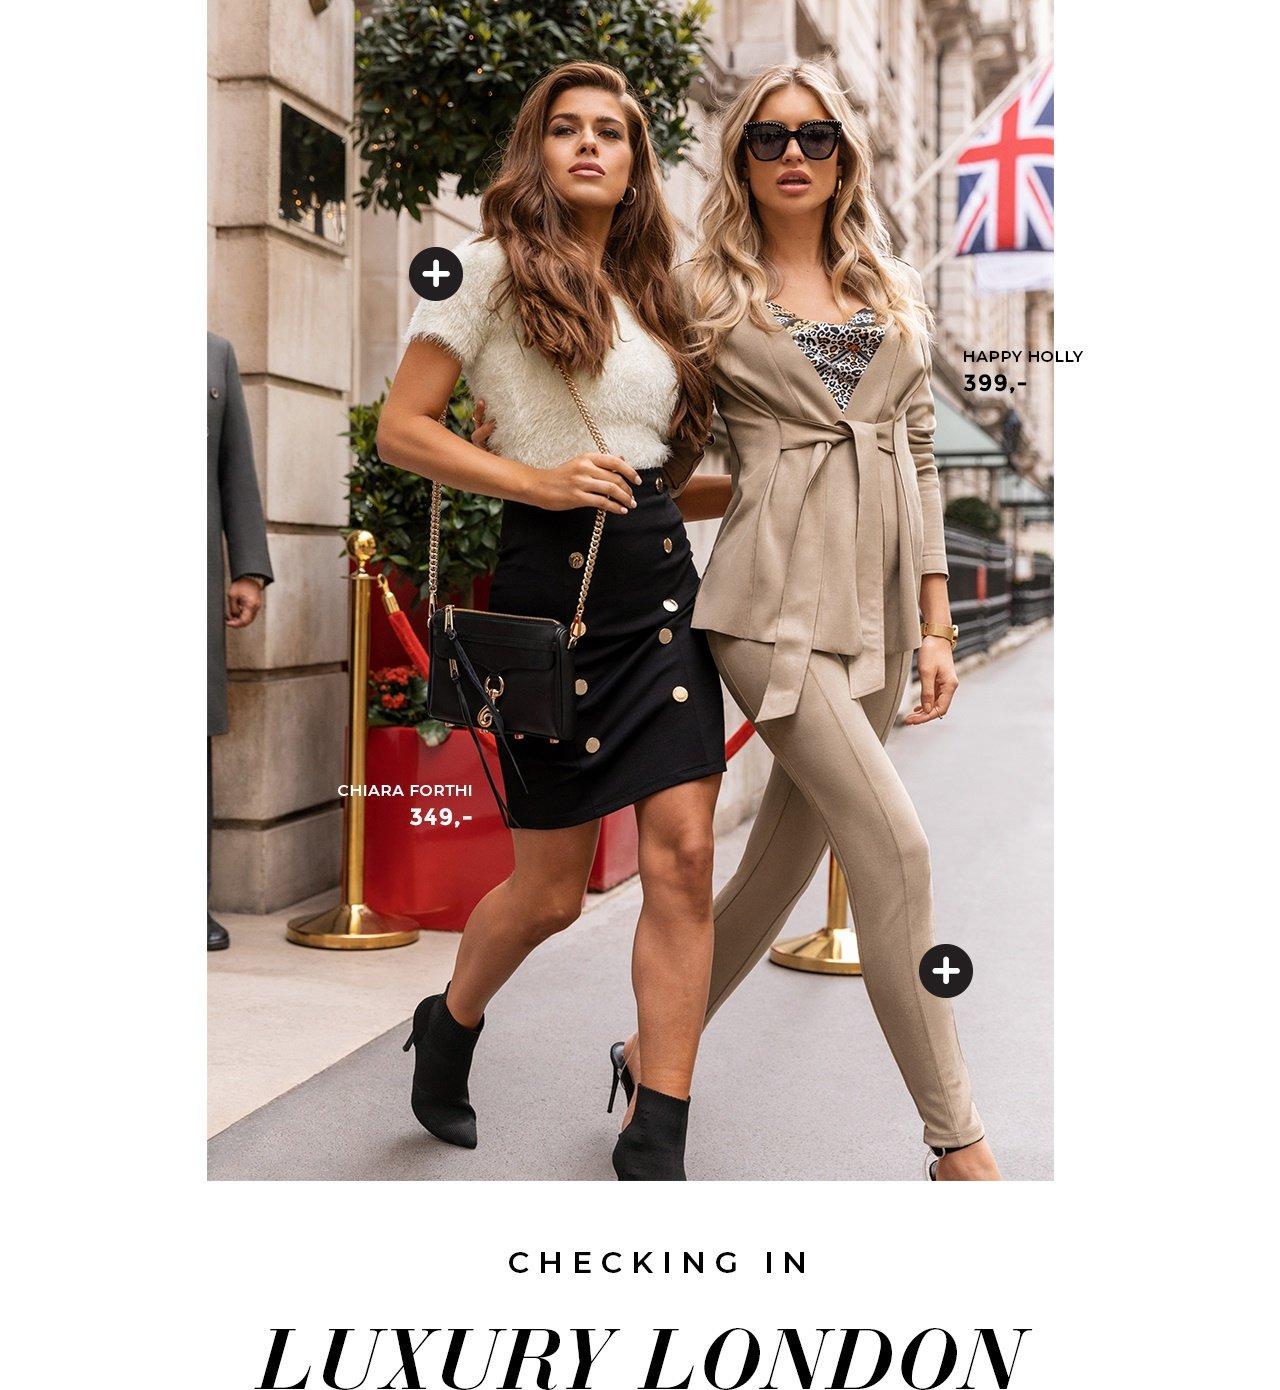 Shop nyheder fra Chiara Forthi & Happy Holly